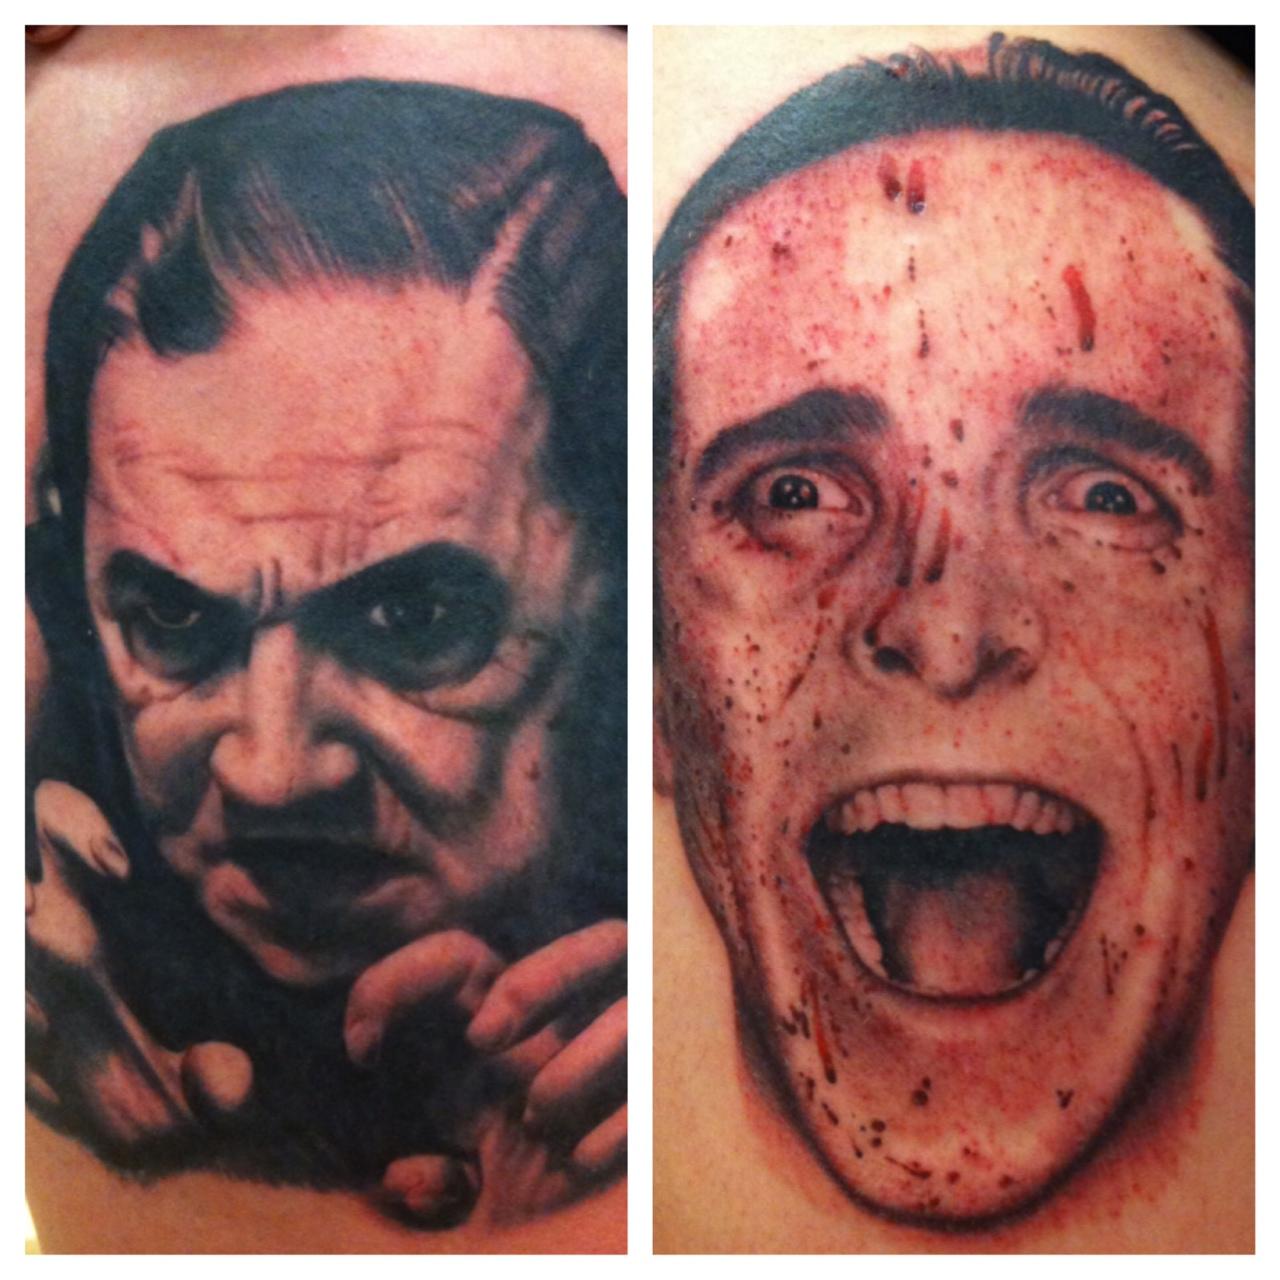 Tattoo for Tattoo cost per hour